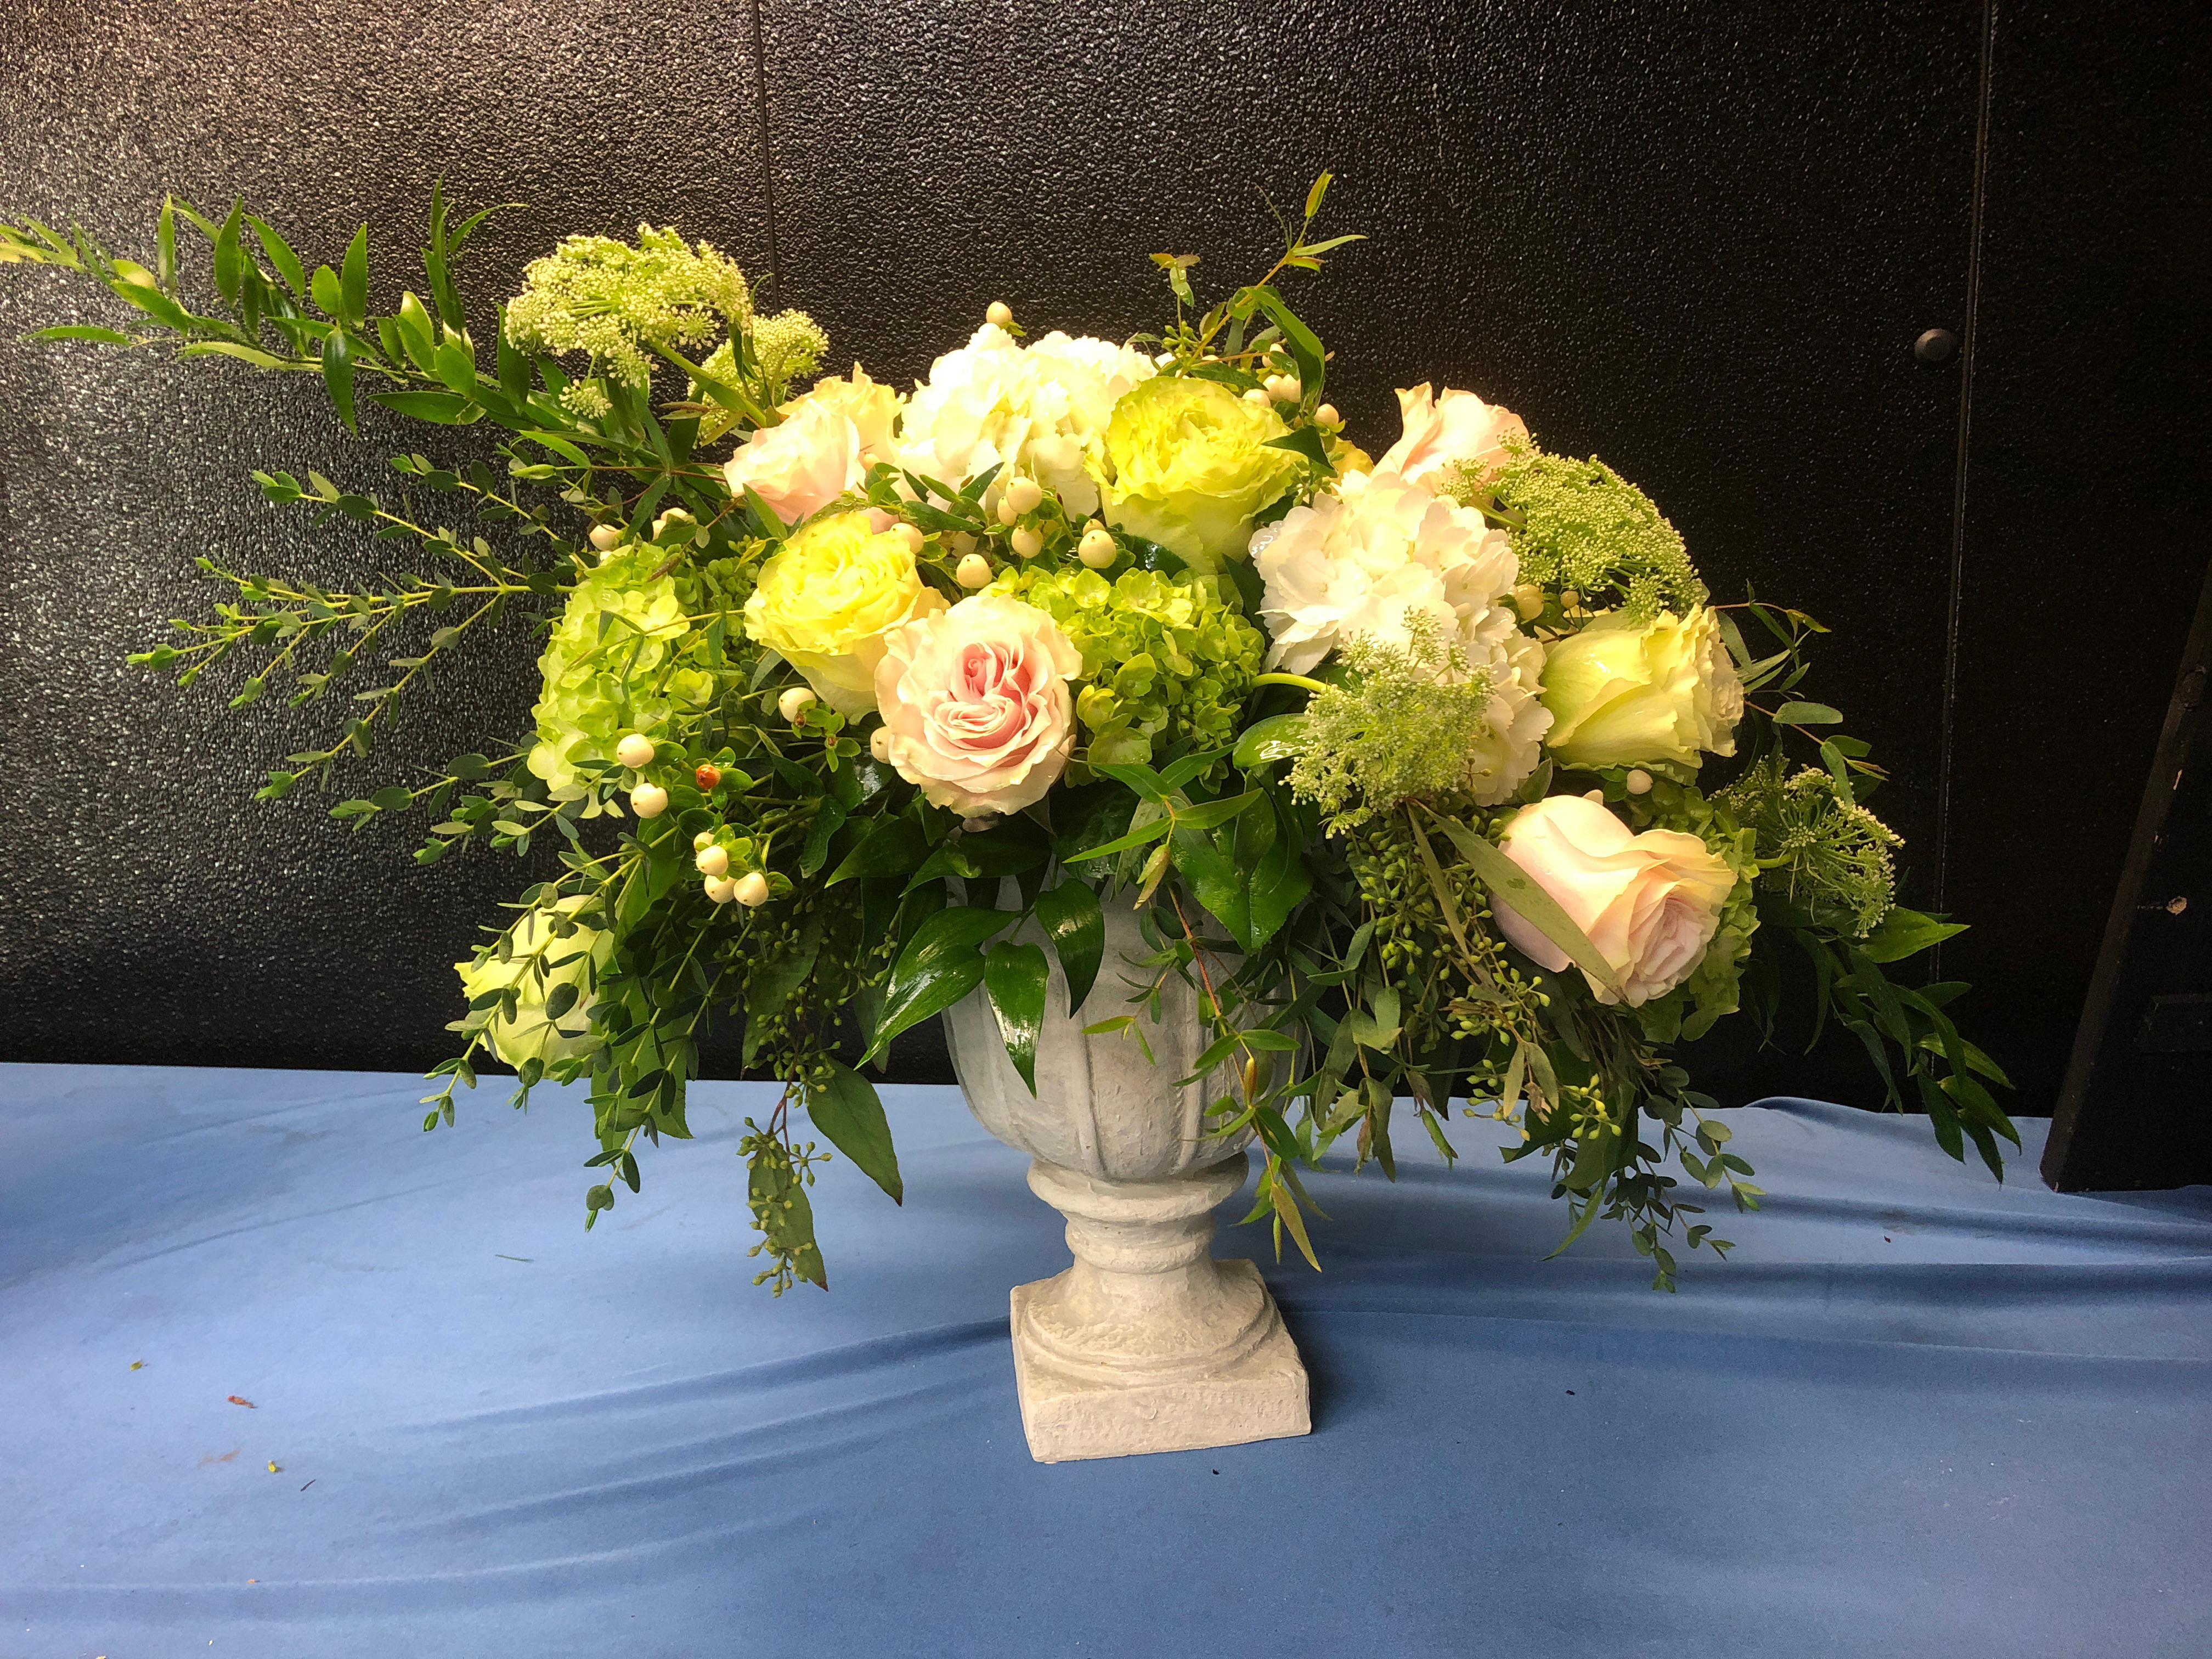 Pat's Florist And Gourmet Baskets Inc image 1